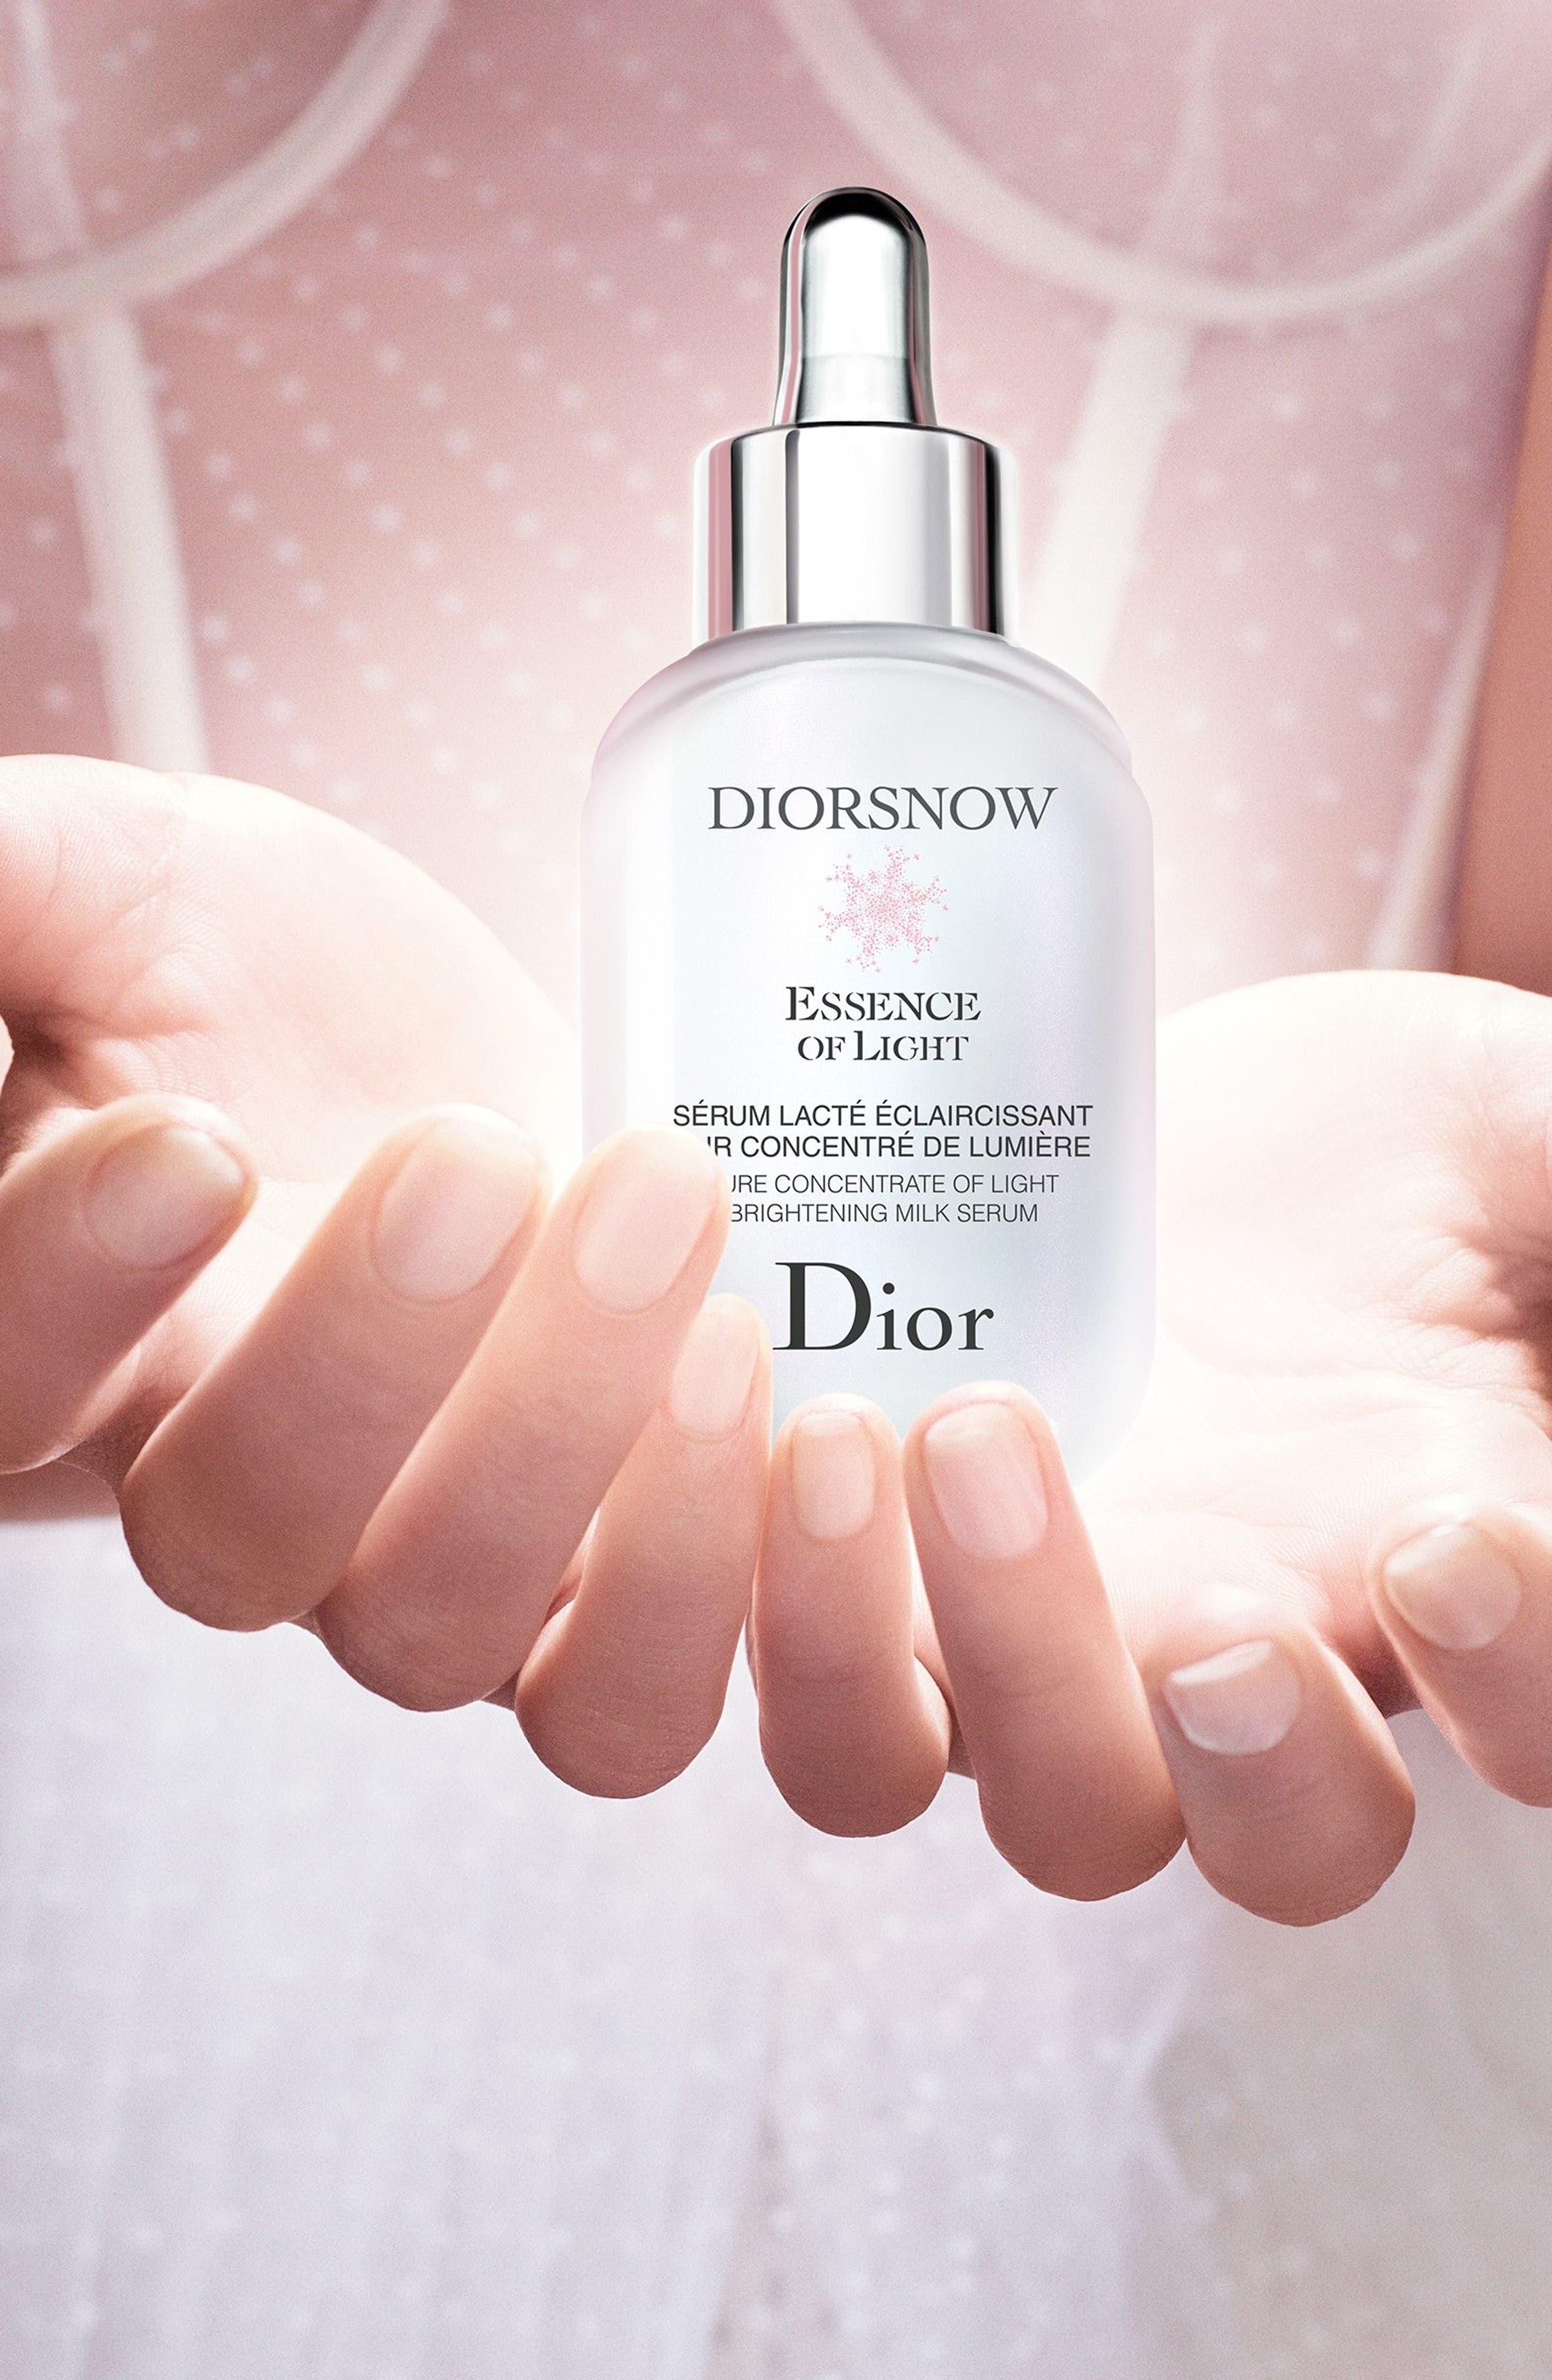 Diorsnow Essence of Light Brightening Milk Serum,                             Alternate thumbnail 8, color,                             NO COLOR